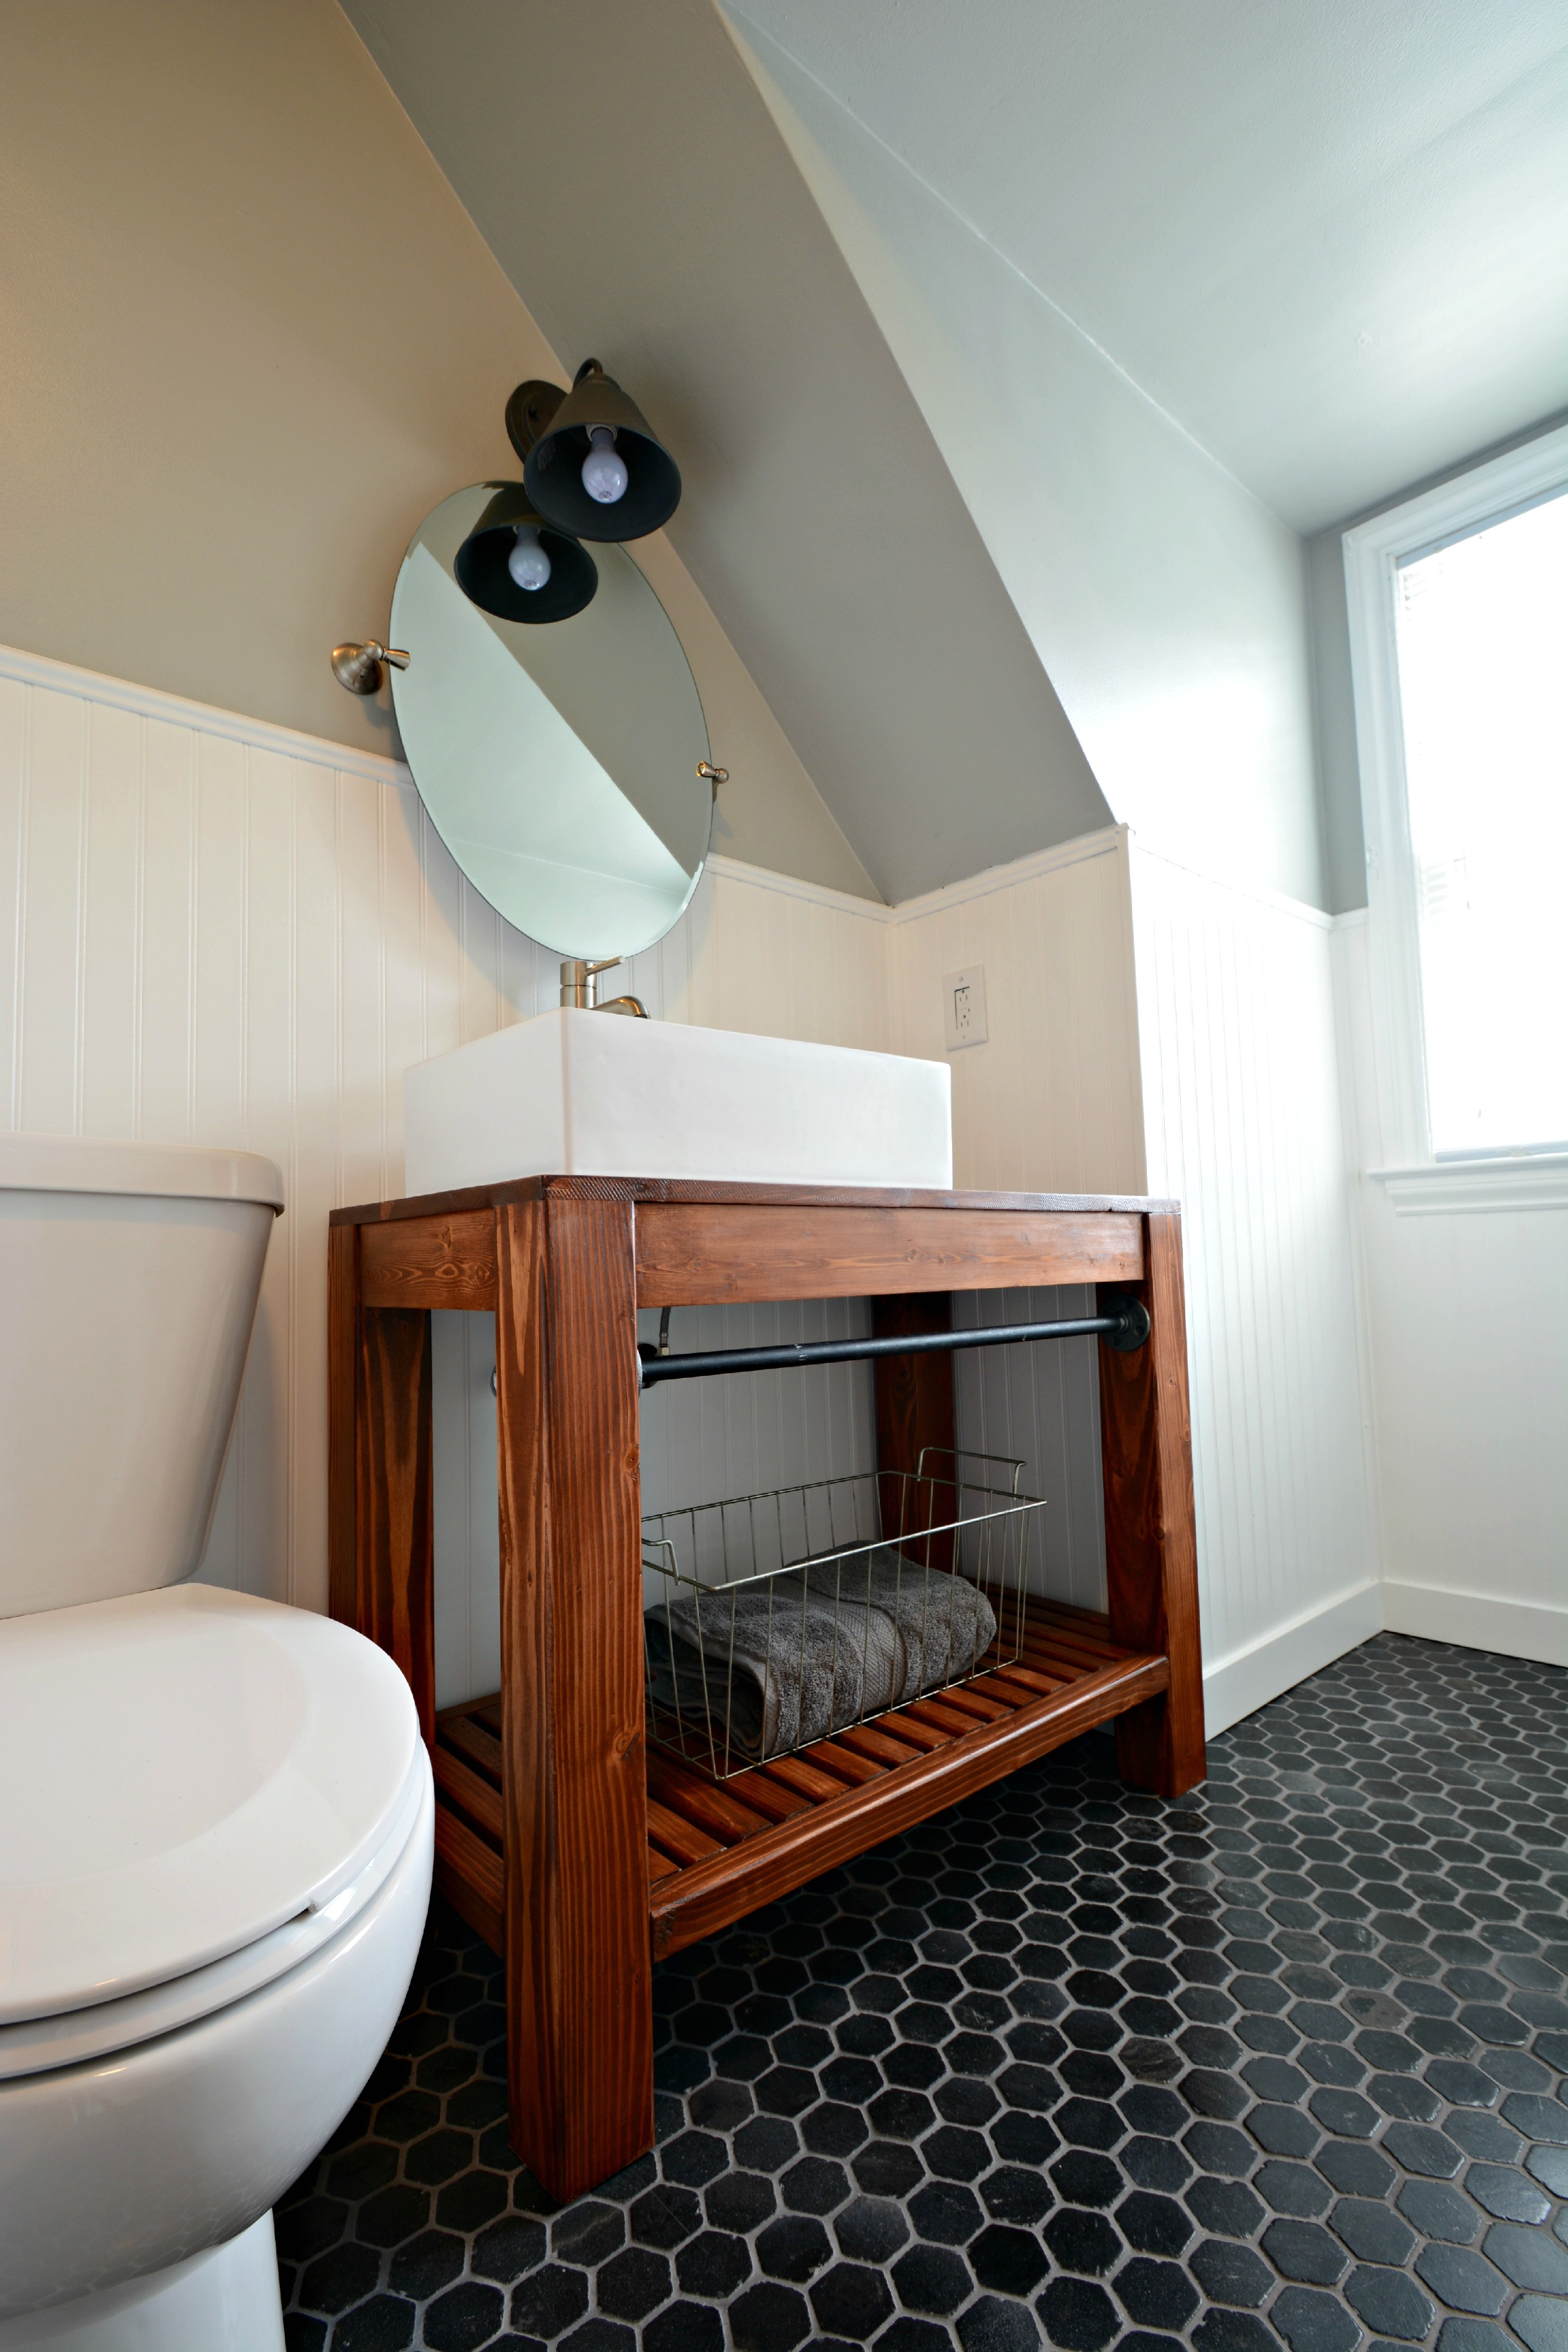 DIY Farmhouse Bathroom Vanity Ideas The Cottage Market